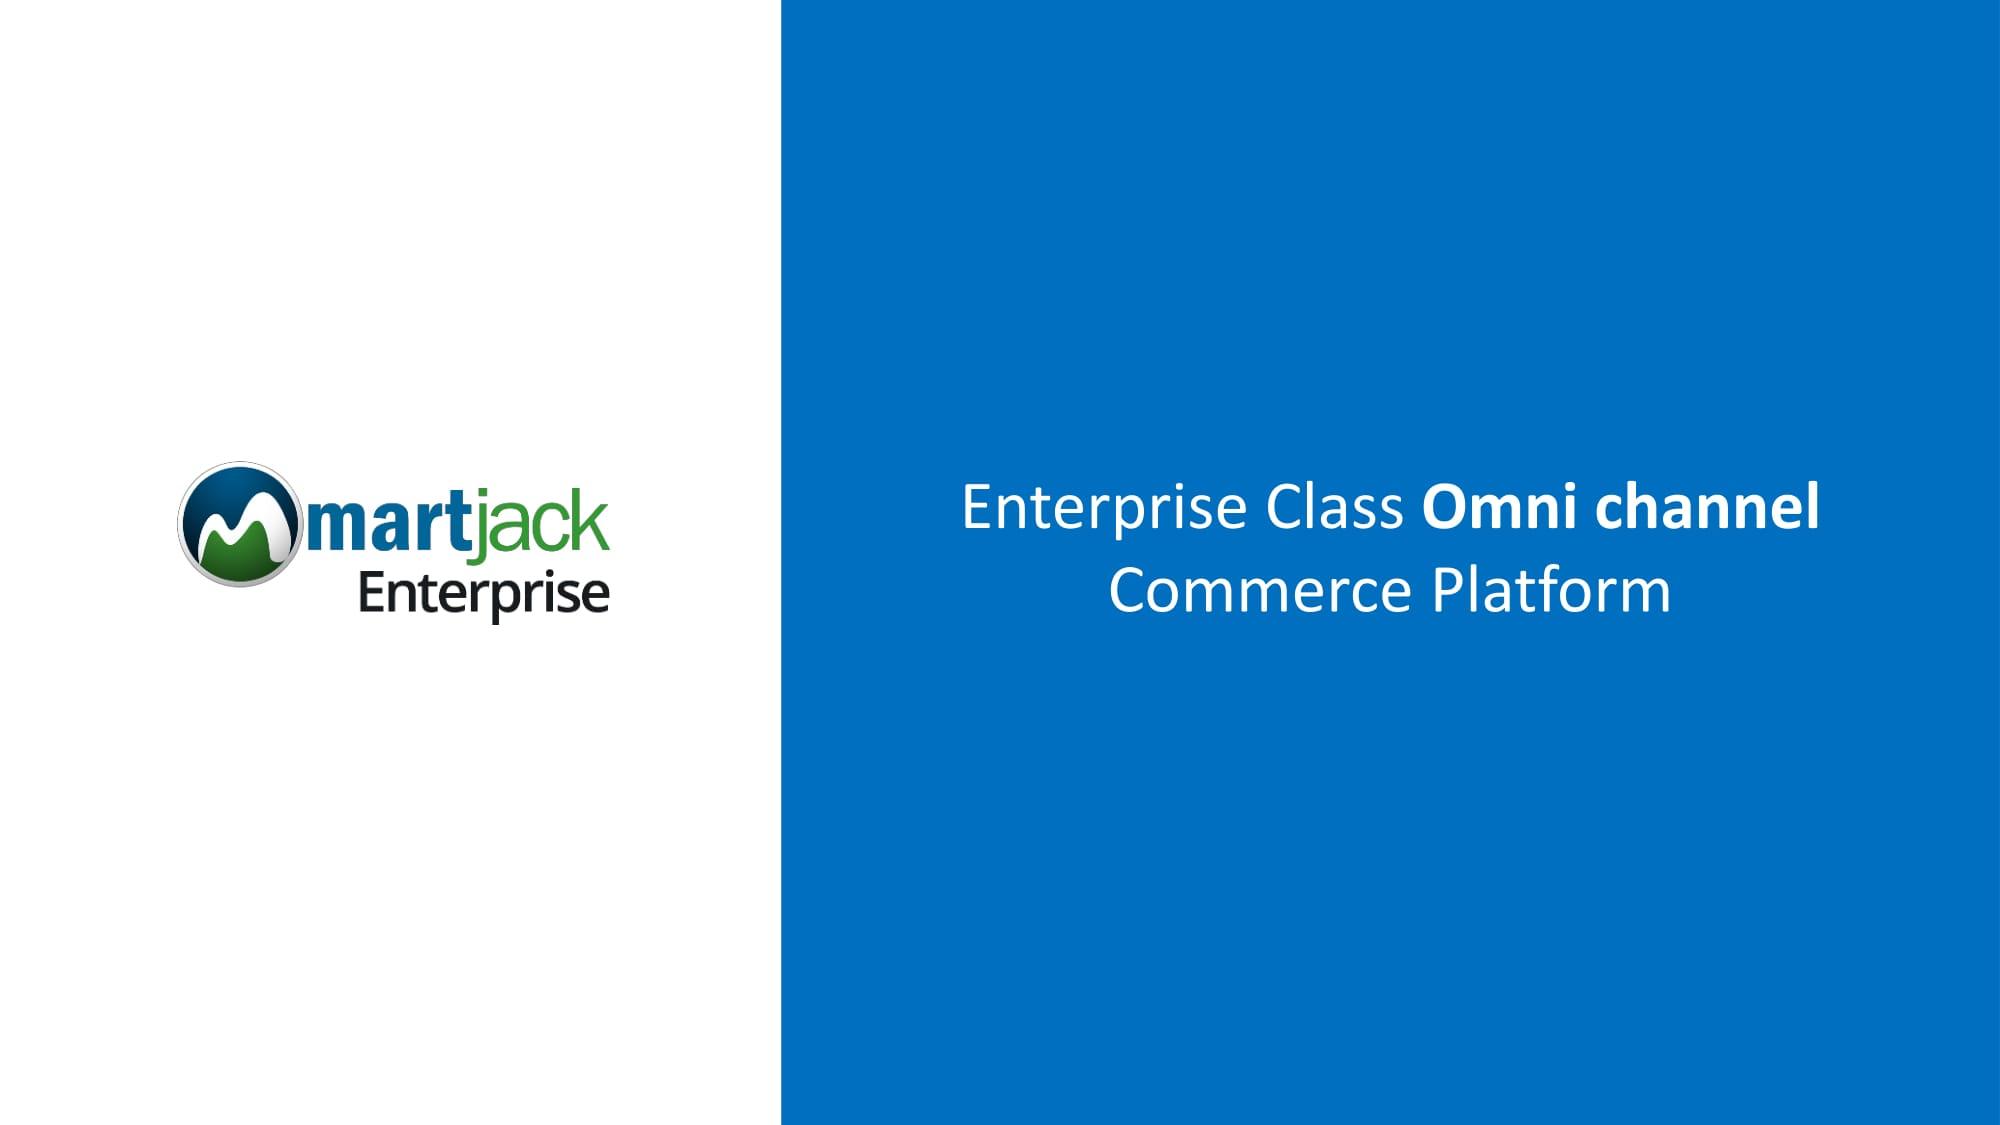 martjack_corporate_and_platform_overview-01